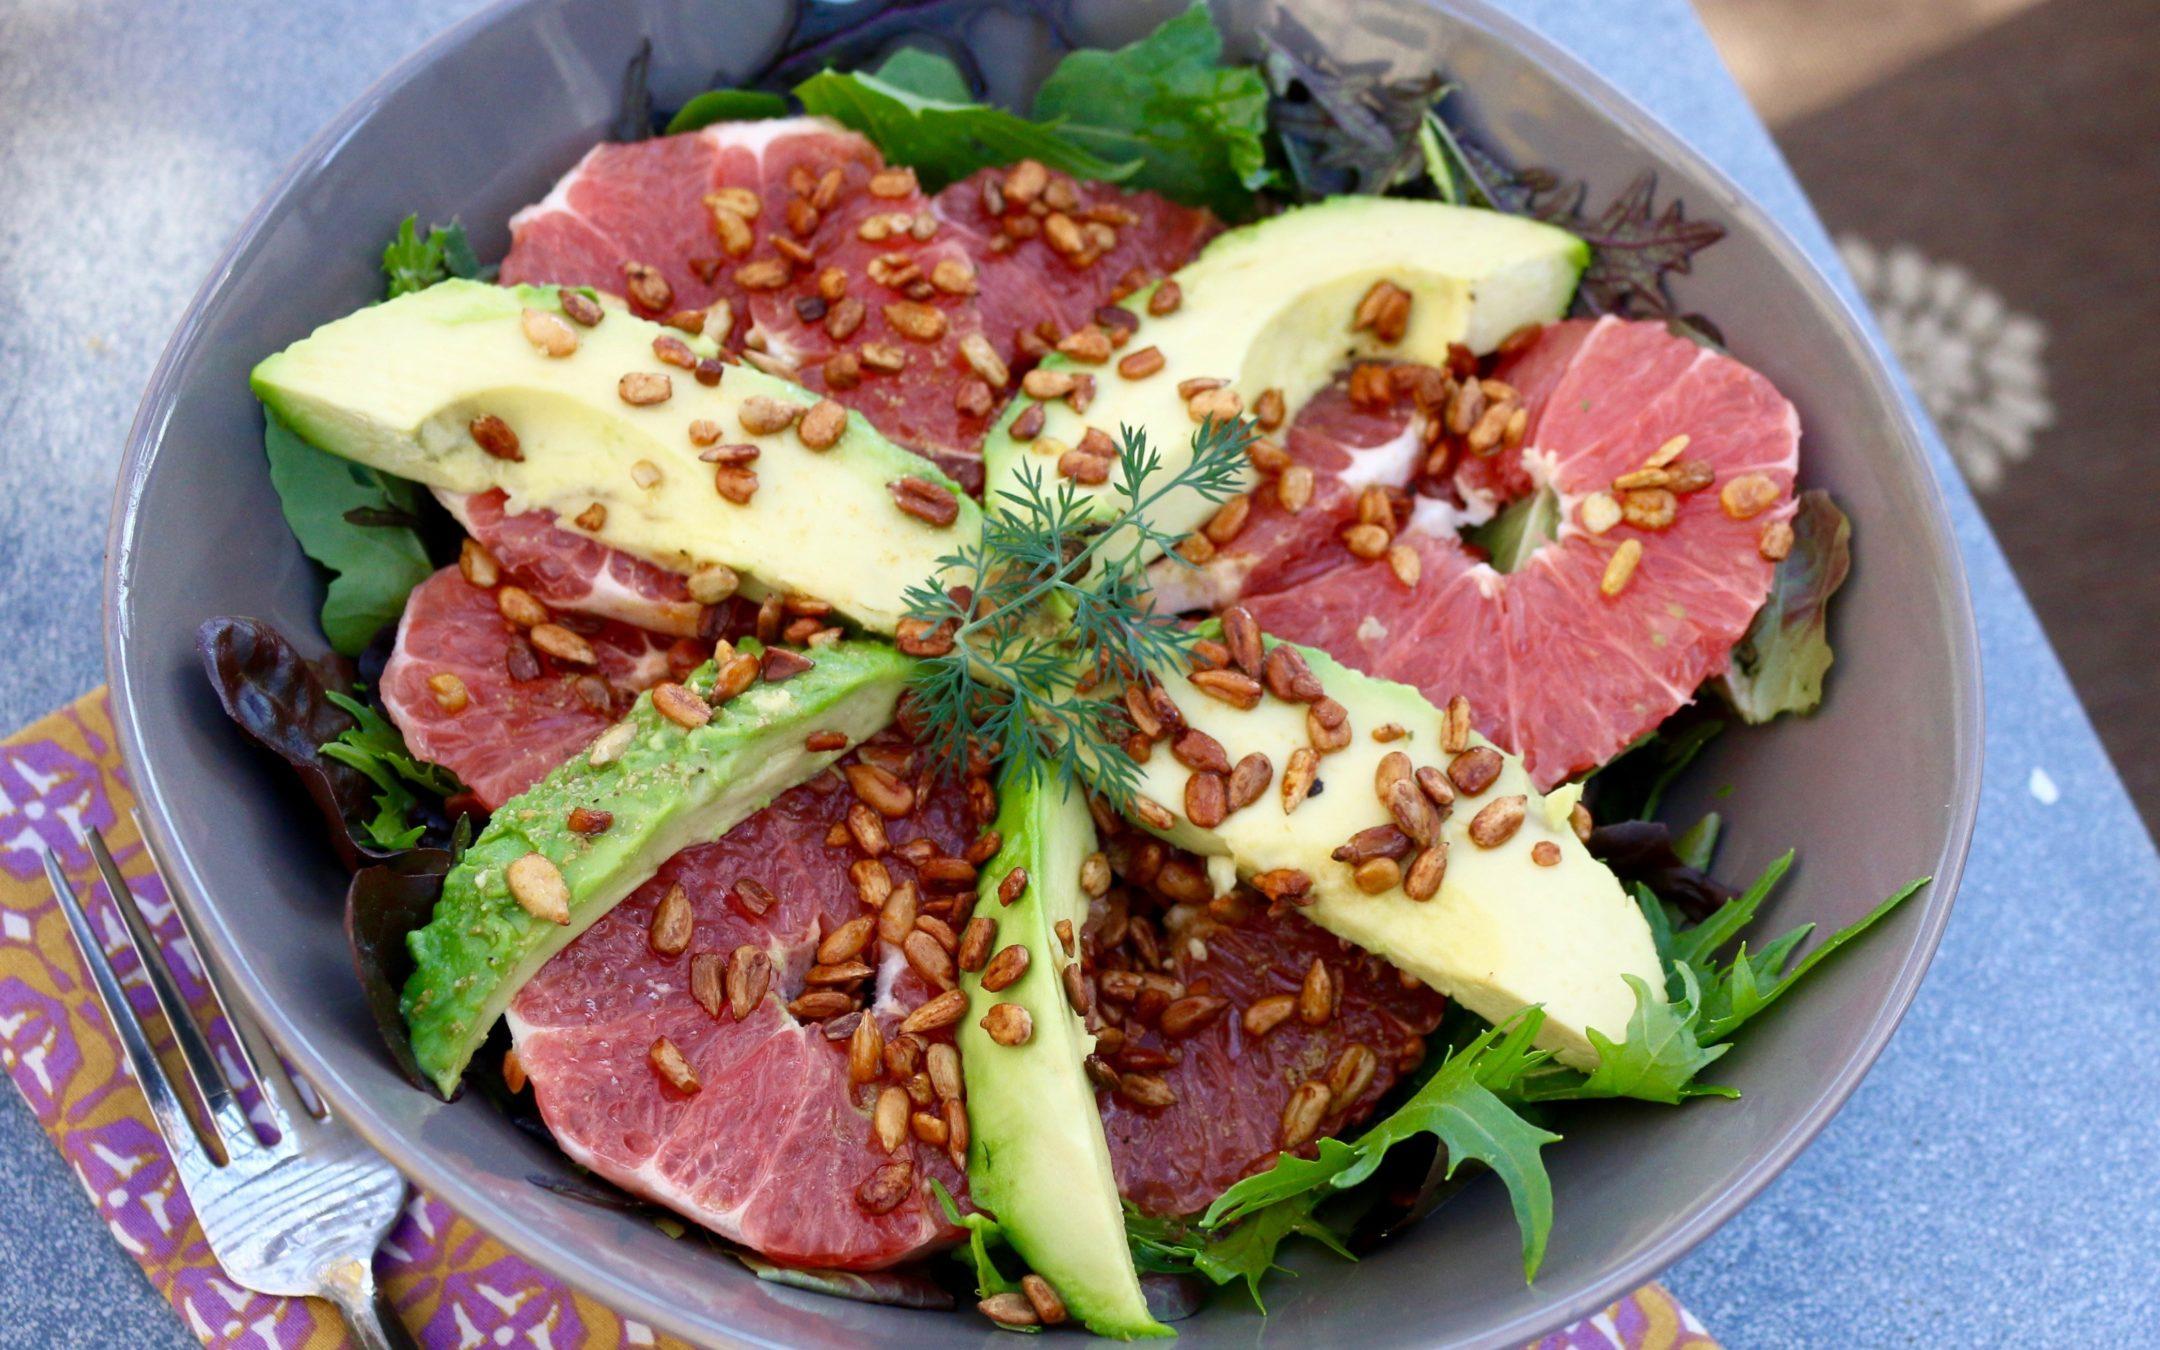 Grapefruit and Avocado Salad with Lemon Cumin Vinaigrette (Vegan, Gluten-Free)